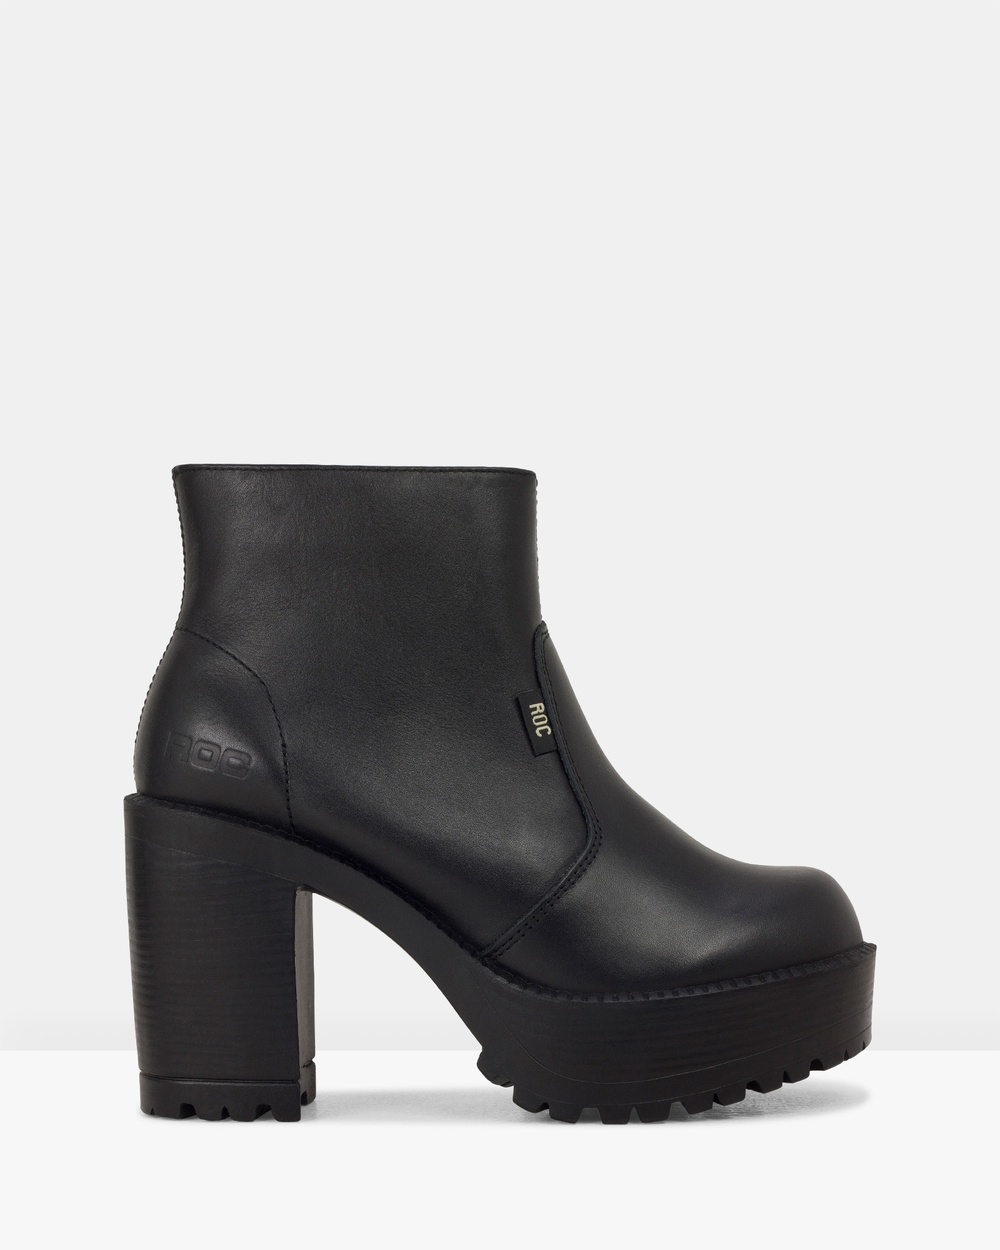 ROC Boots Australia Gosh Heels Black Gosh